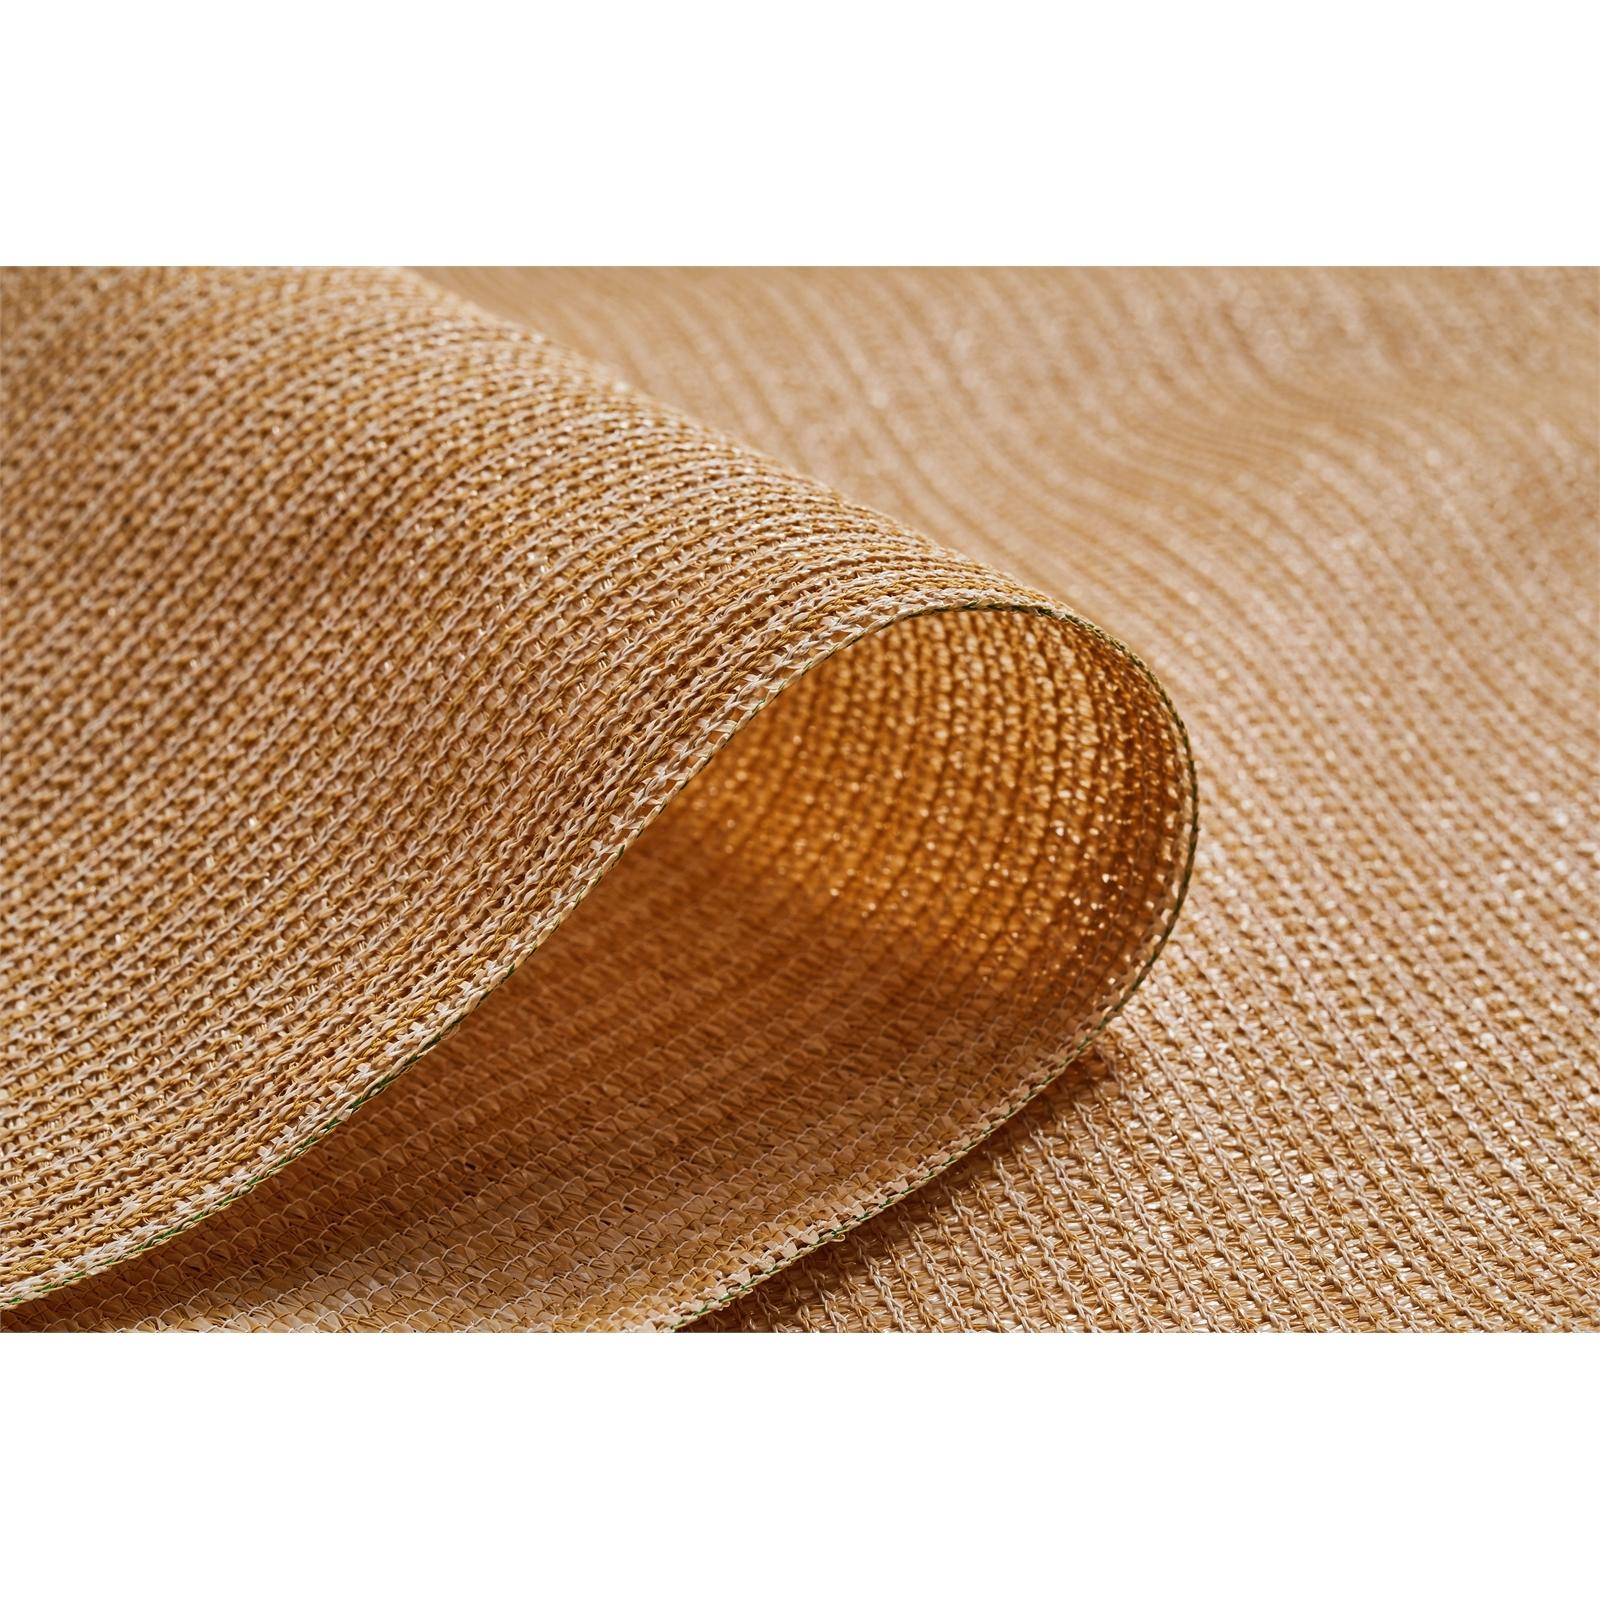 Coolaroo 1.83m Beech 90% UV Heavy-Duty People Cover Shade Cloth - Per Metre